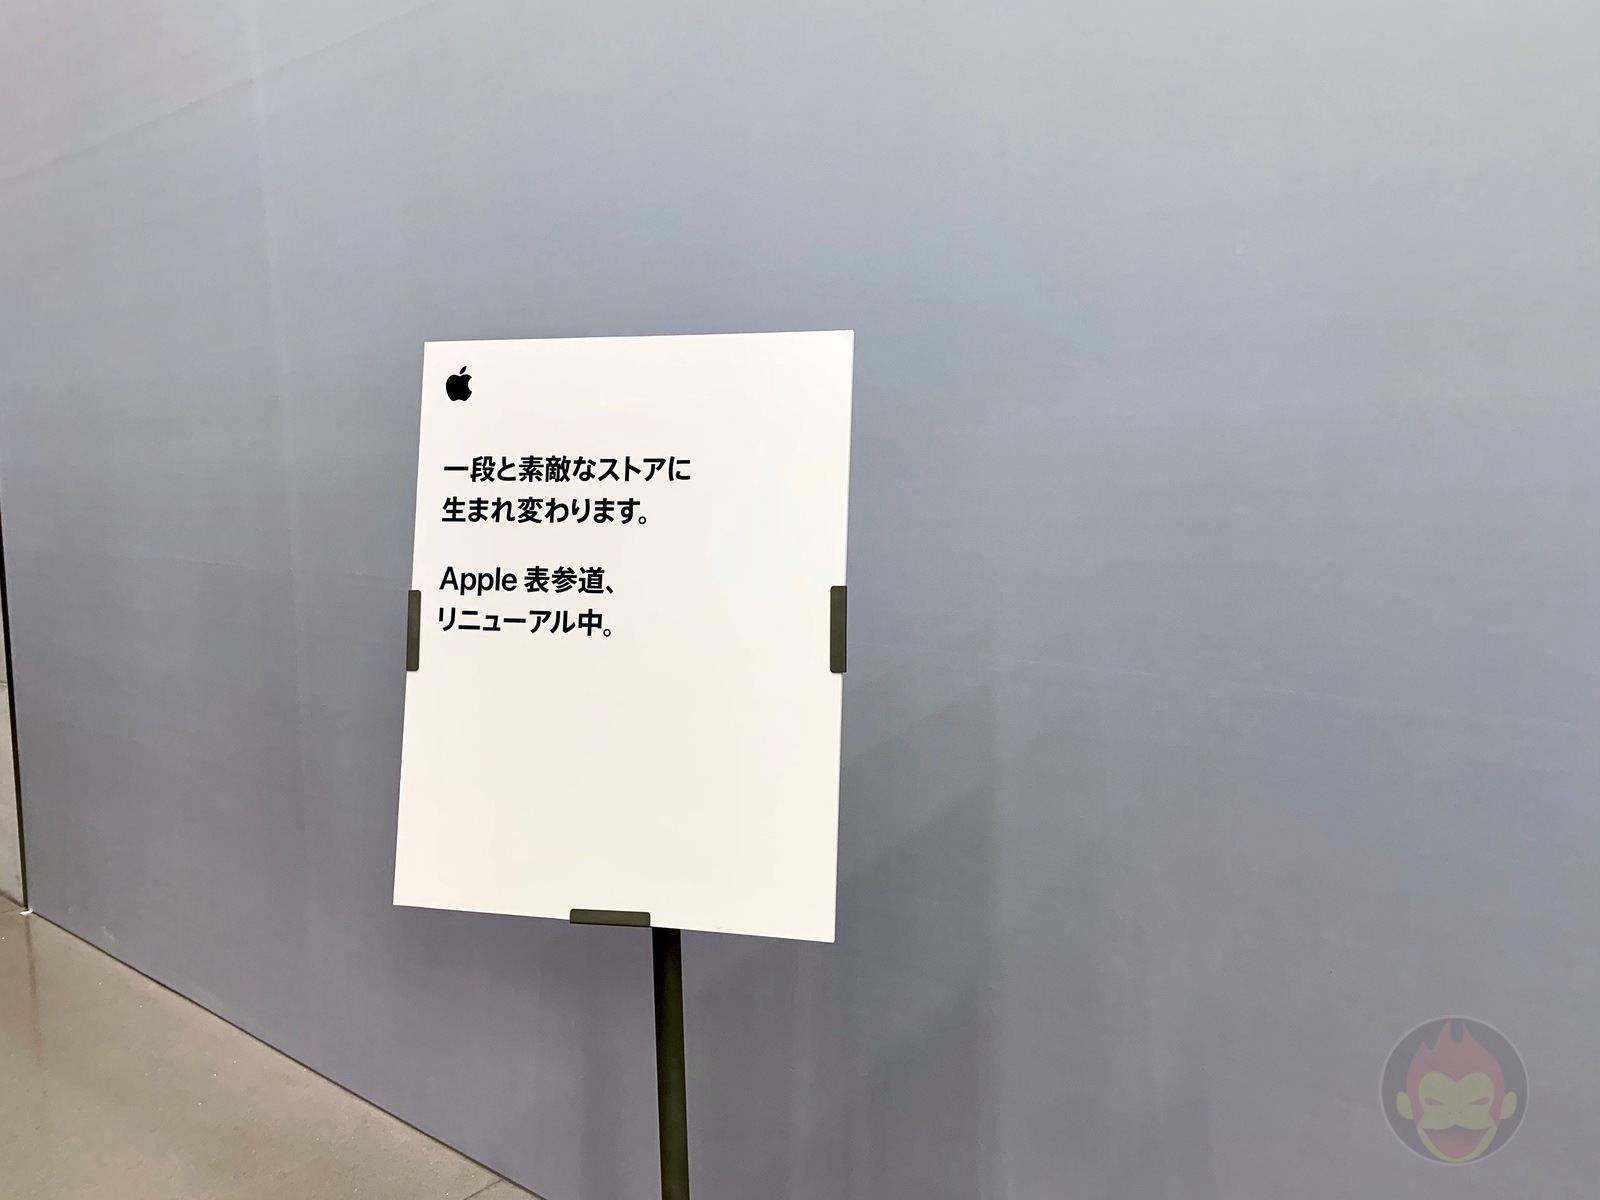 Apple-Omotesando-Renewal-2019-05.jpg